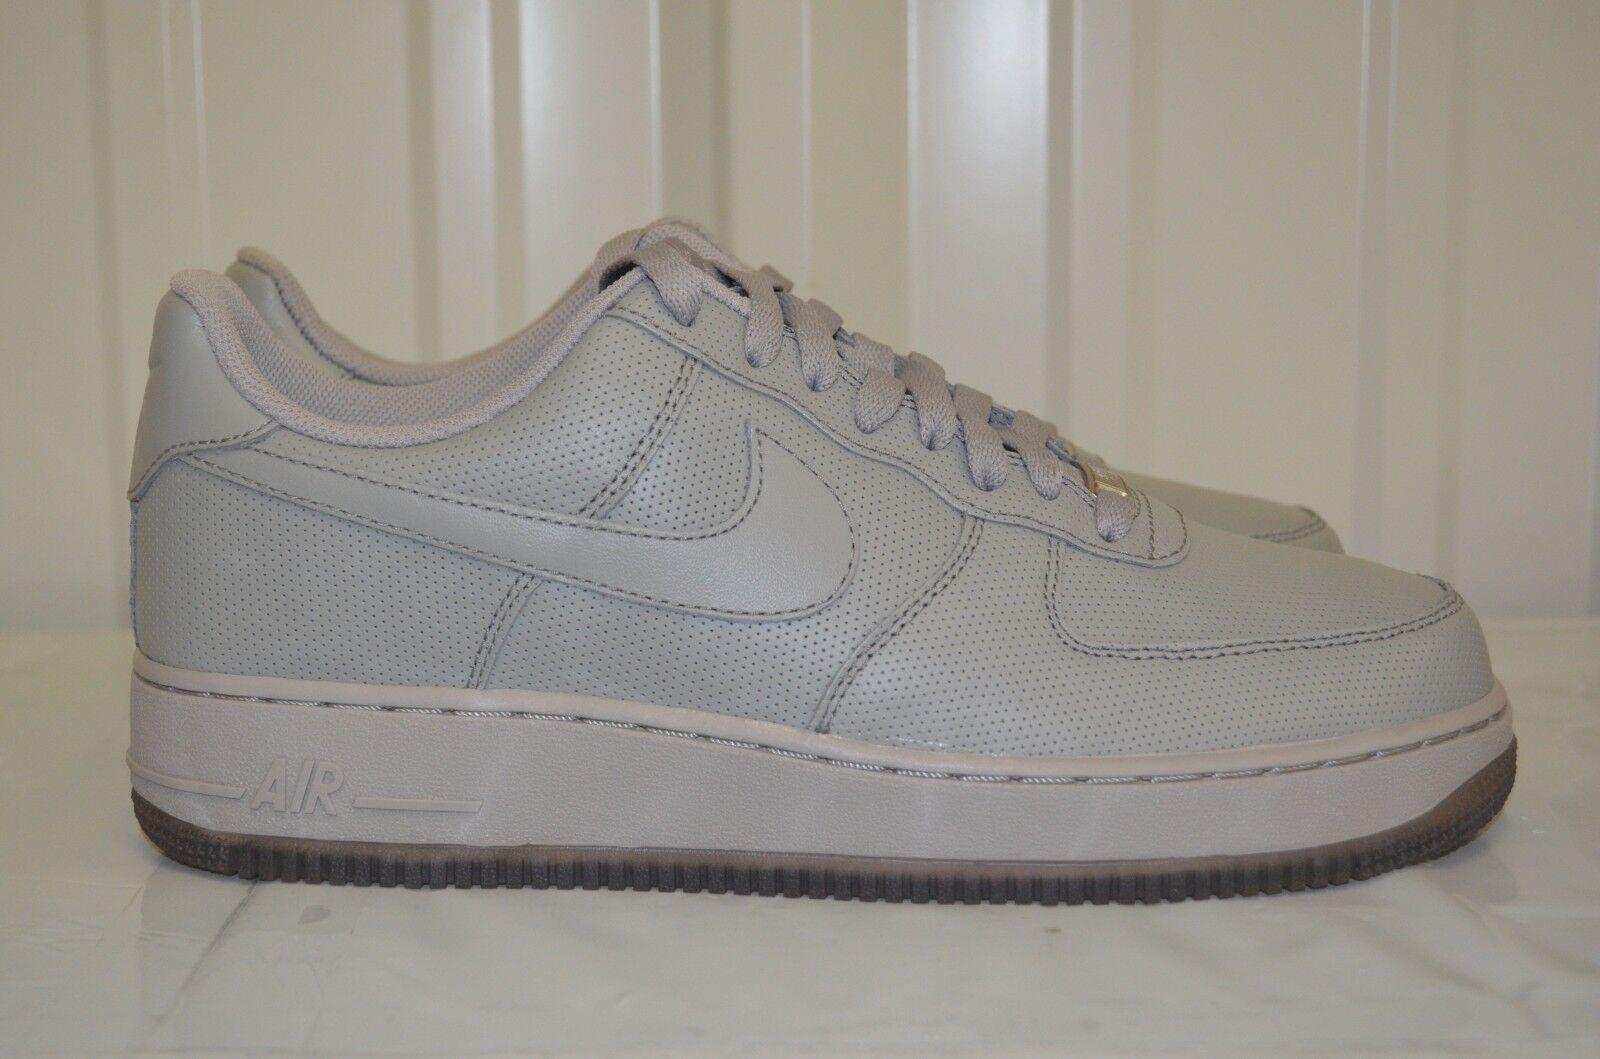 Men's Nike Air Force 1 '07 Medium Grey casual classic 315122-029